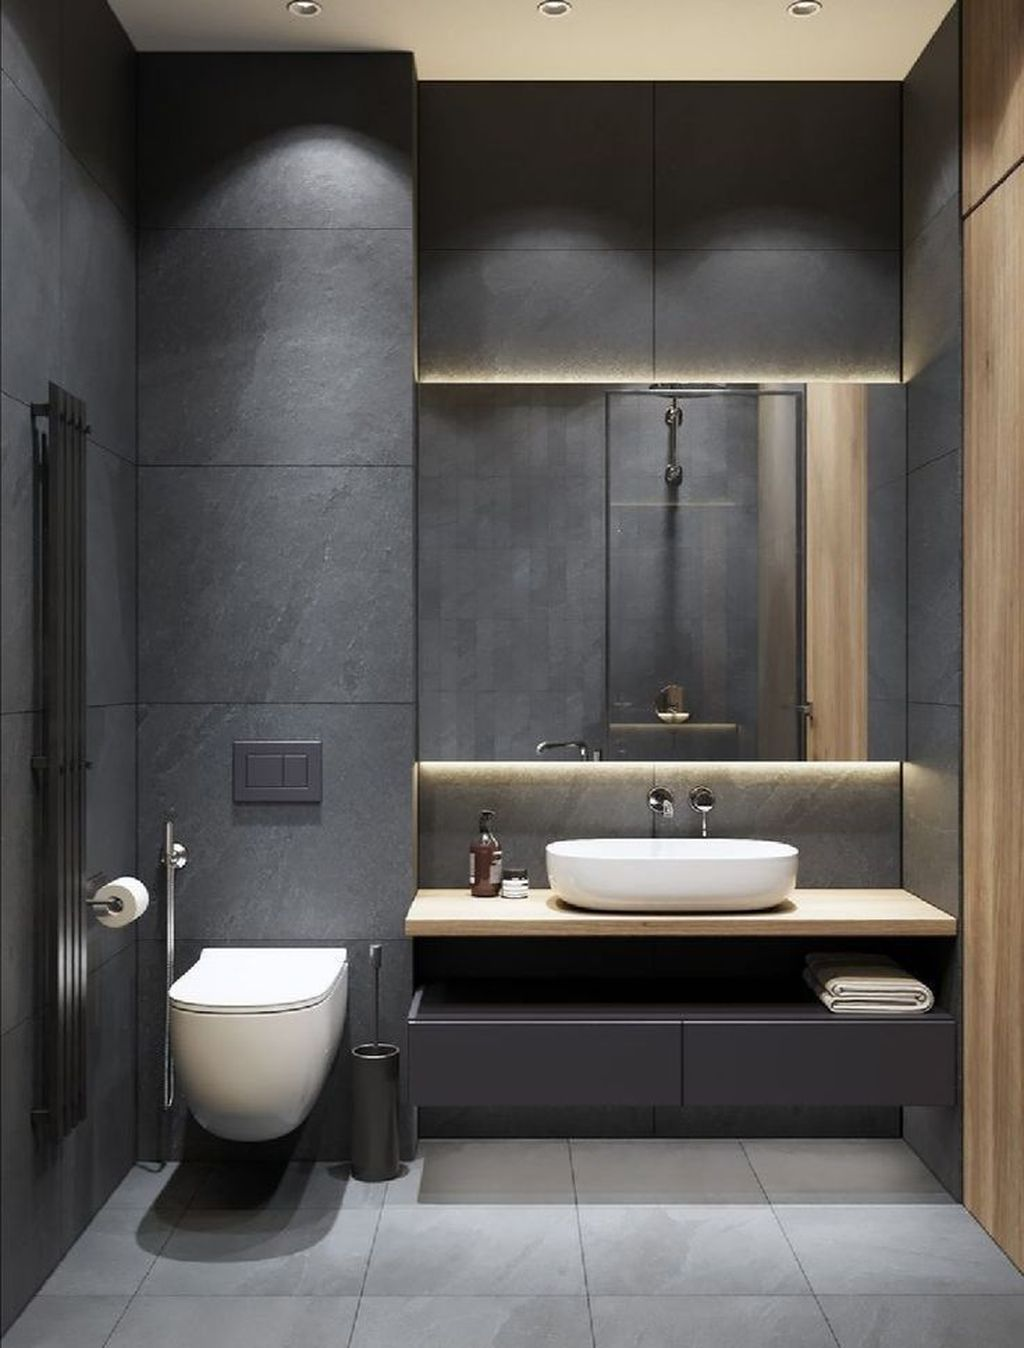 36 Nice Small Bathroom Design Ideas That You Should Copy Washroom Design Minimalist Bathroom Design Restroom Design